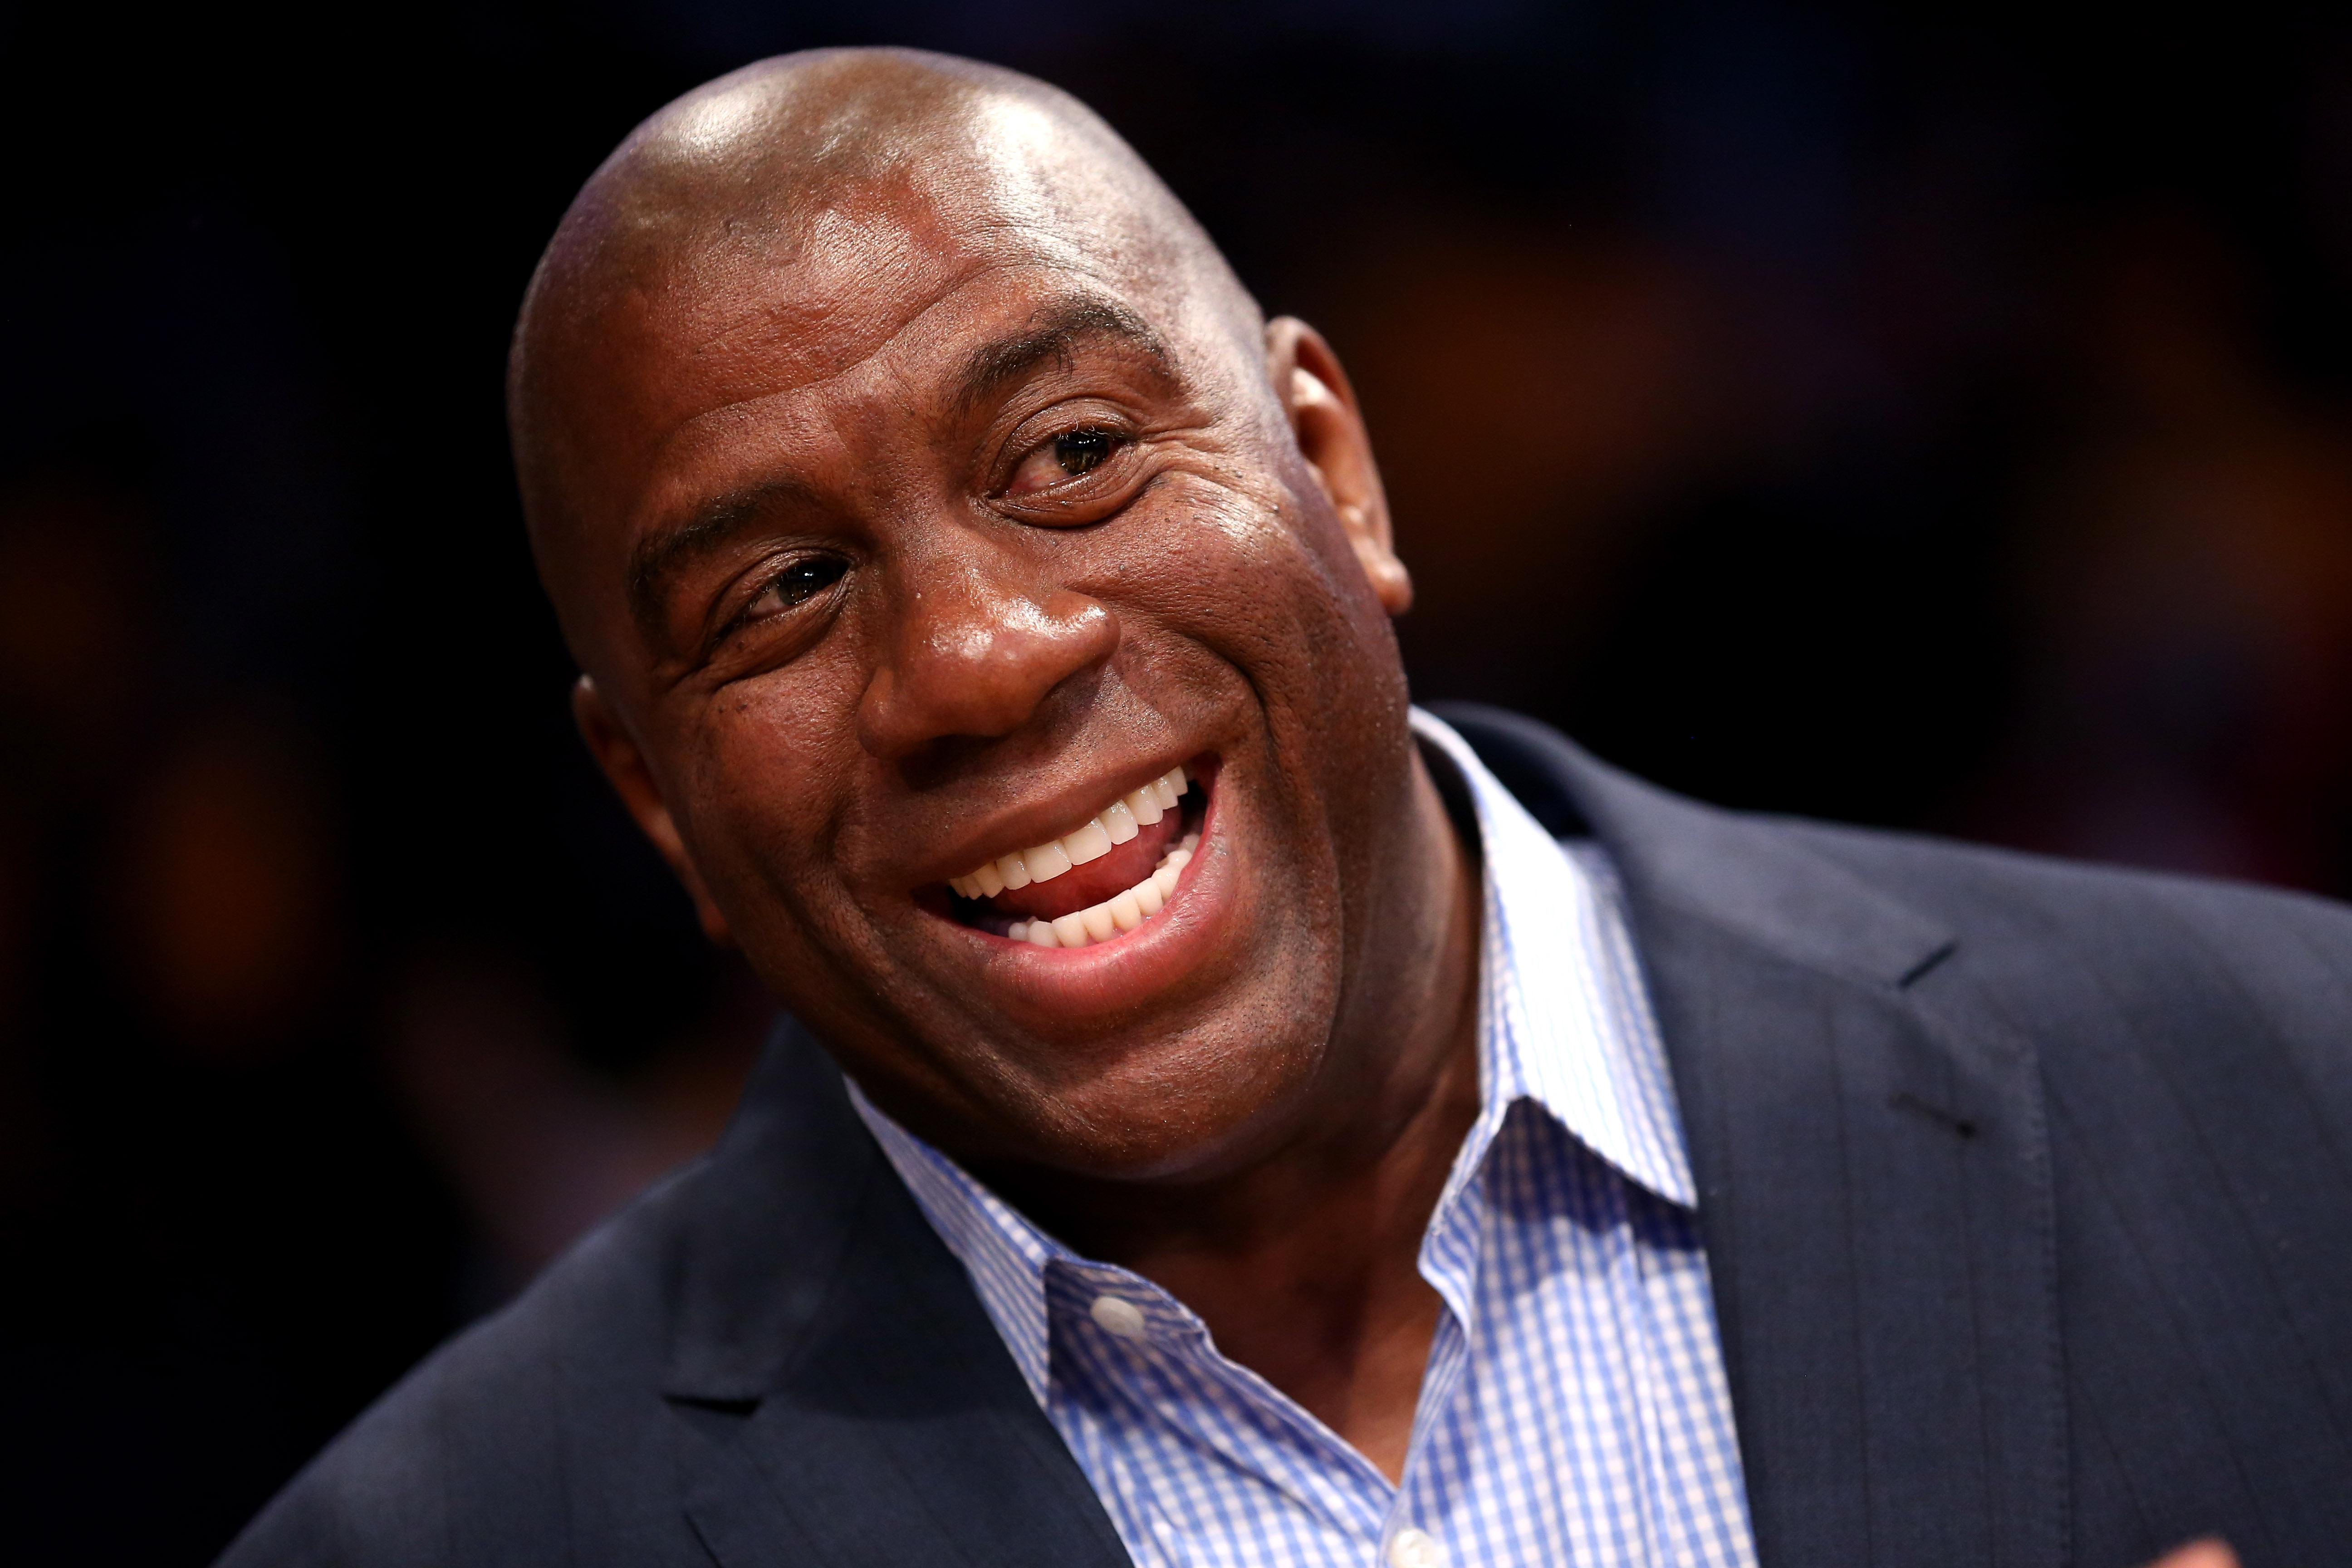 Lakers lonzo ball, lakers 2017 draft pick, lakers pick, lonzo ball nba draft